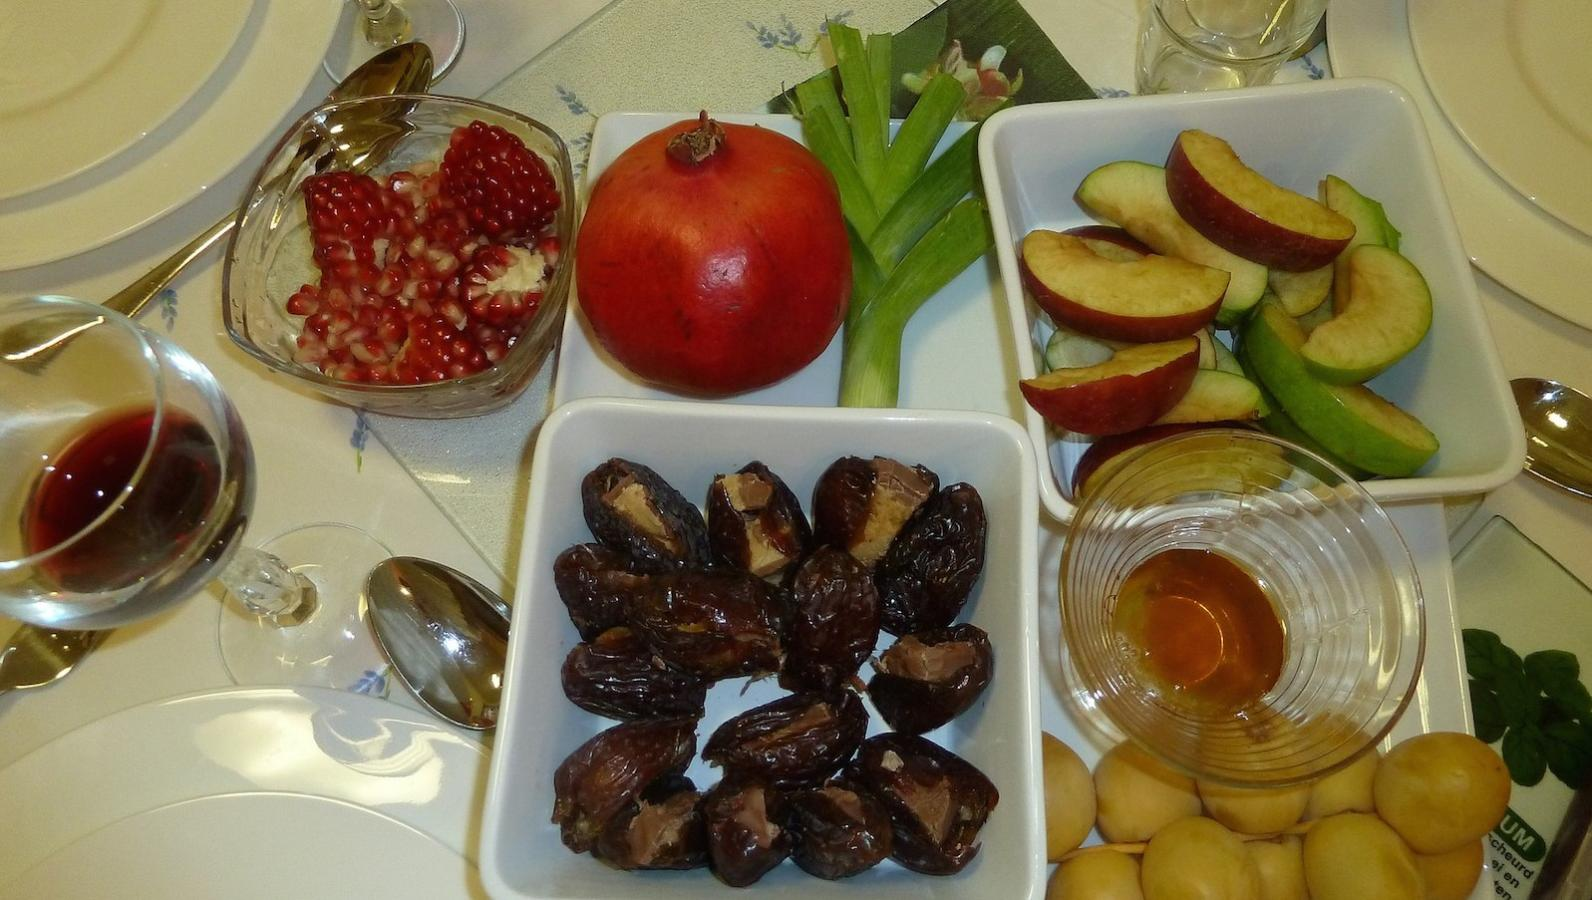 9 Jewish Things About Pomegranates My Jewish Learning